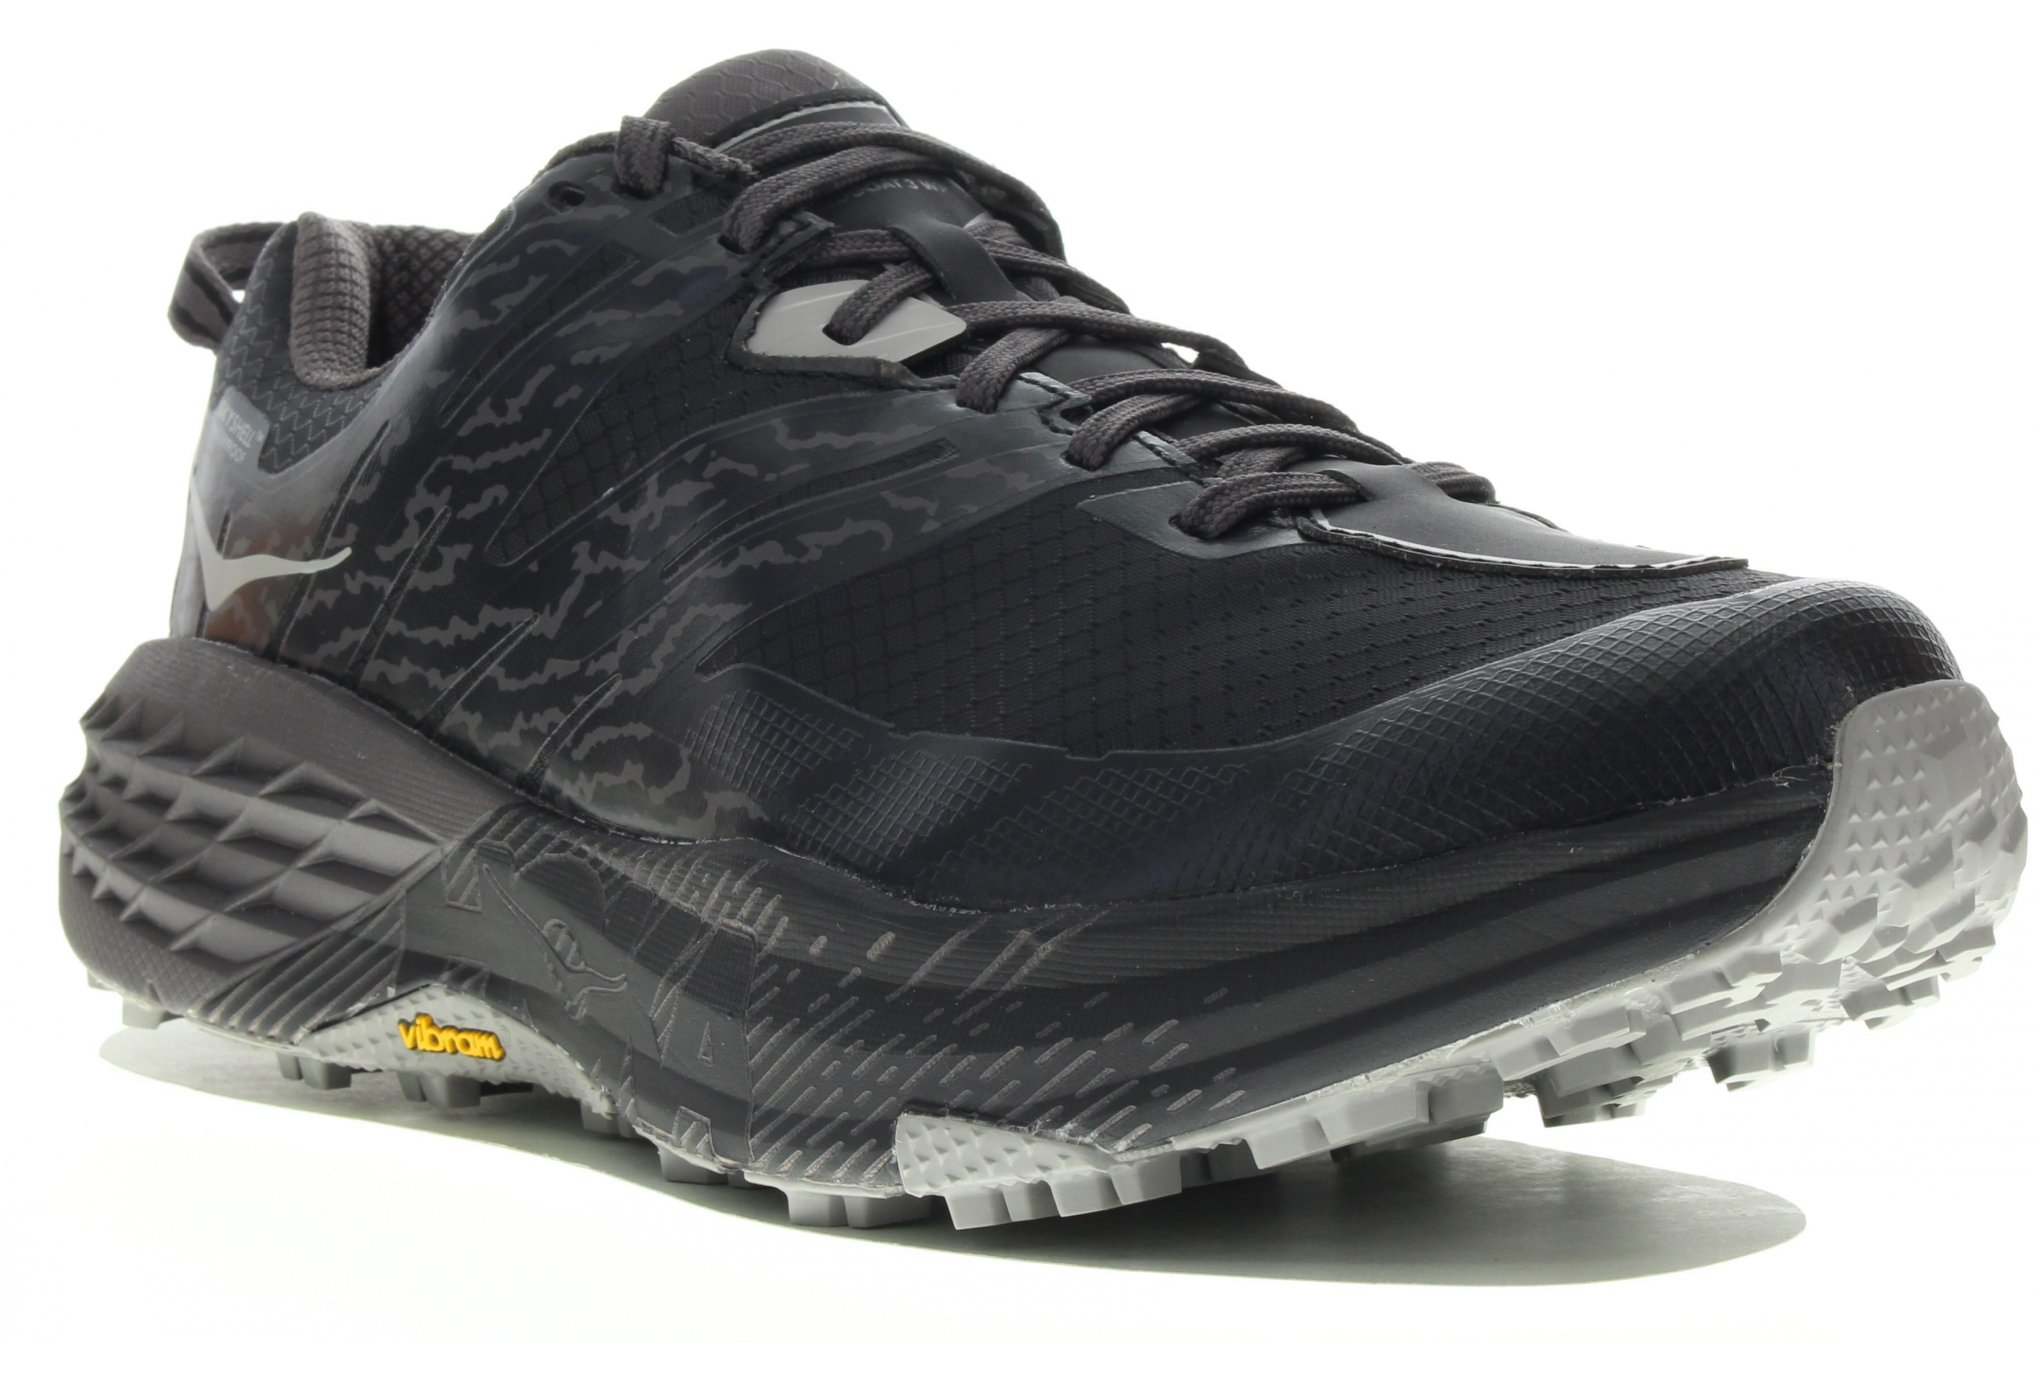 Hoka One One SpeedGoat 3 WP Chaussures homme